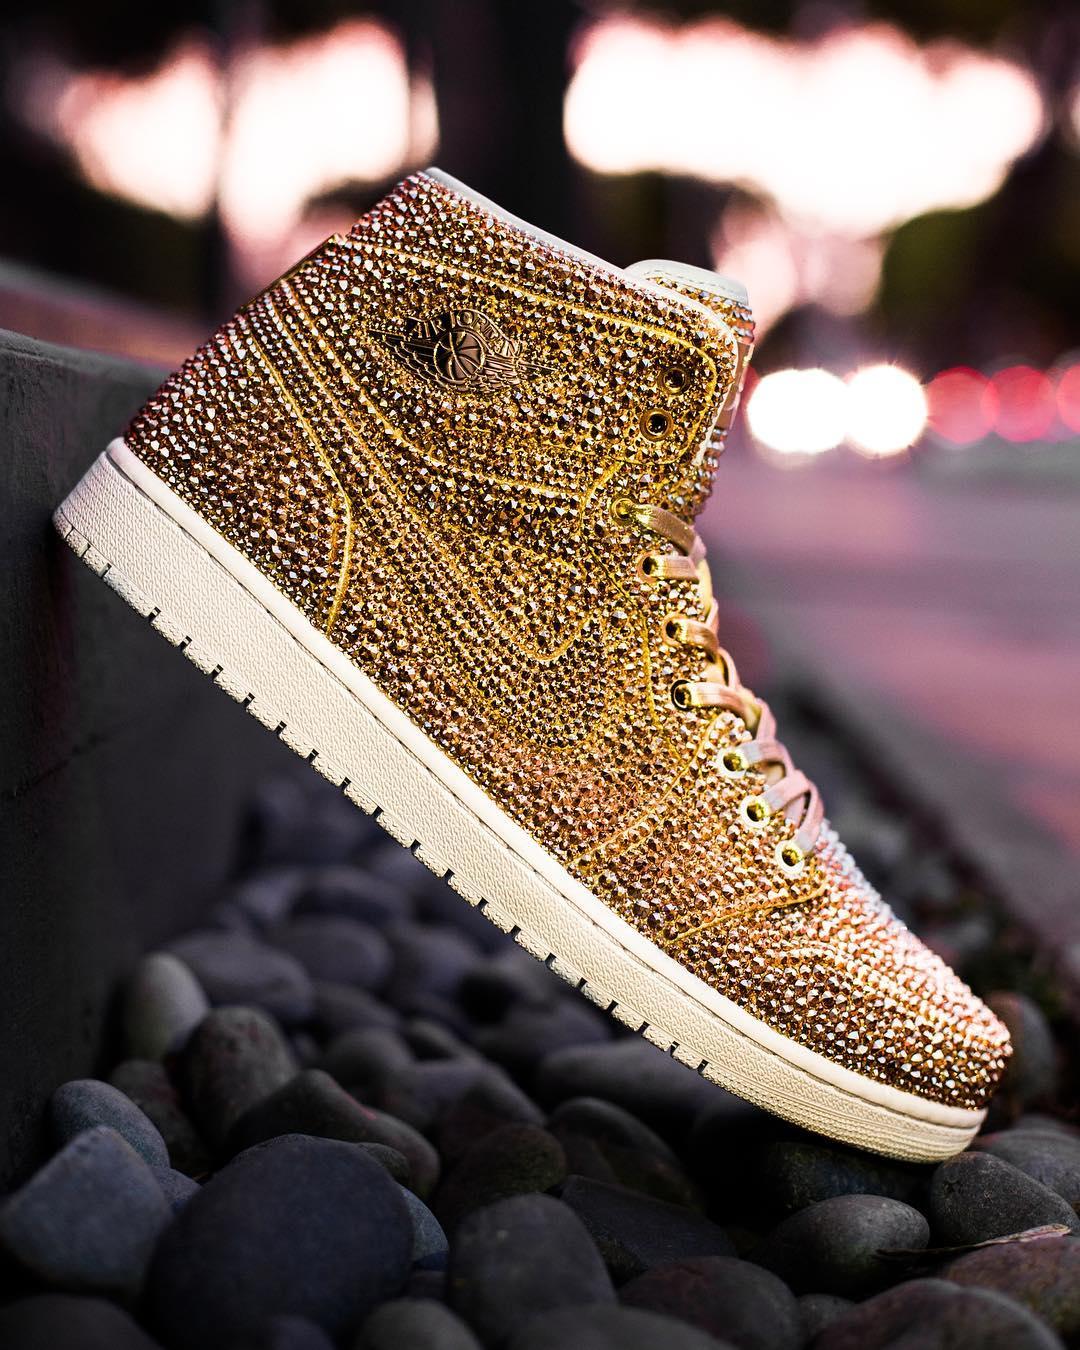 b23998c2a9c Irresistíveis as luxuosas sapatilhas da Nike - MoveNotícias